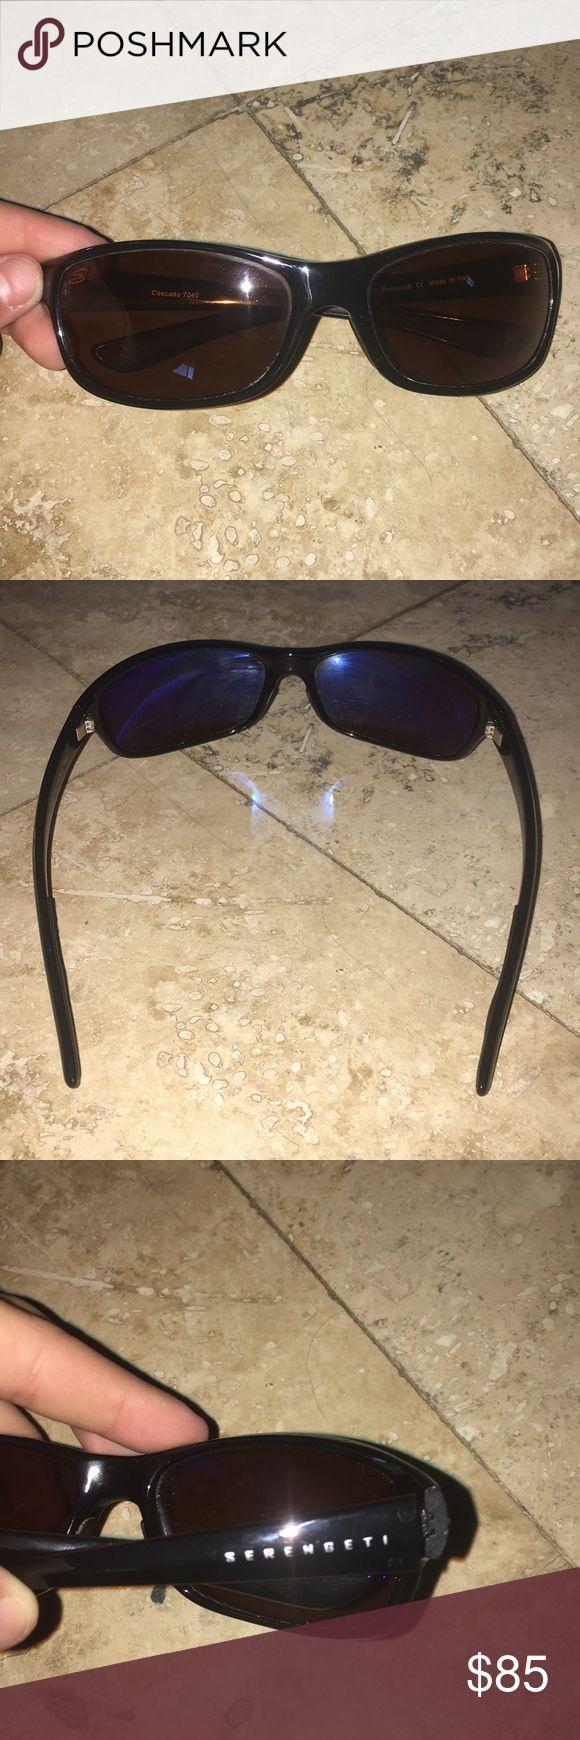 Mens serengeti sunglasses Great condition! Bronze polarized lenses! Serengeti Accessories Glasses